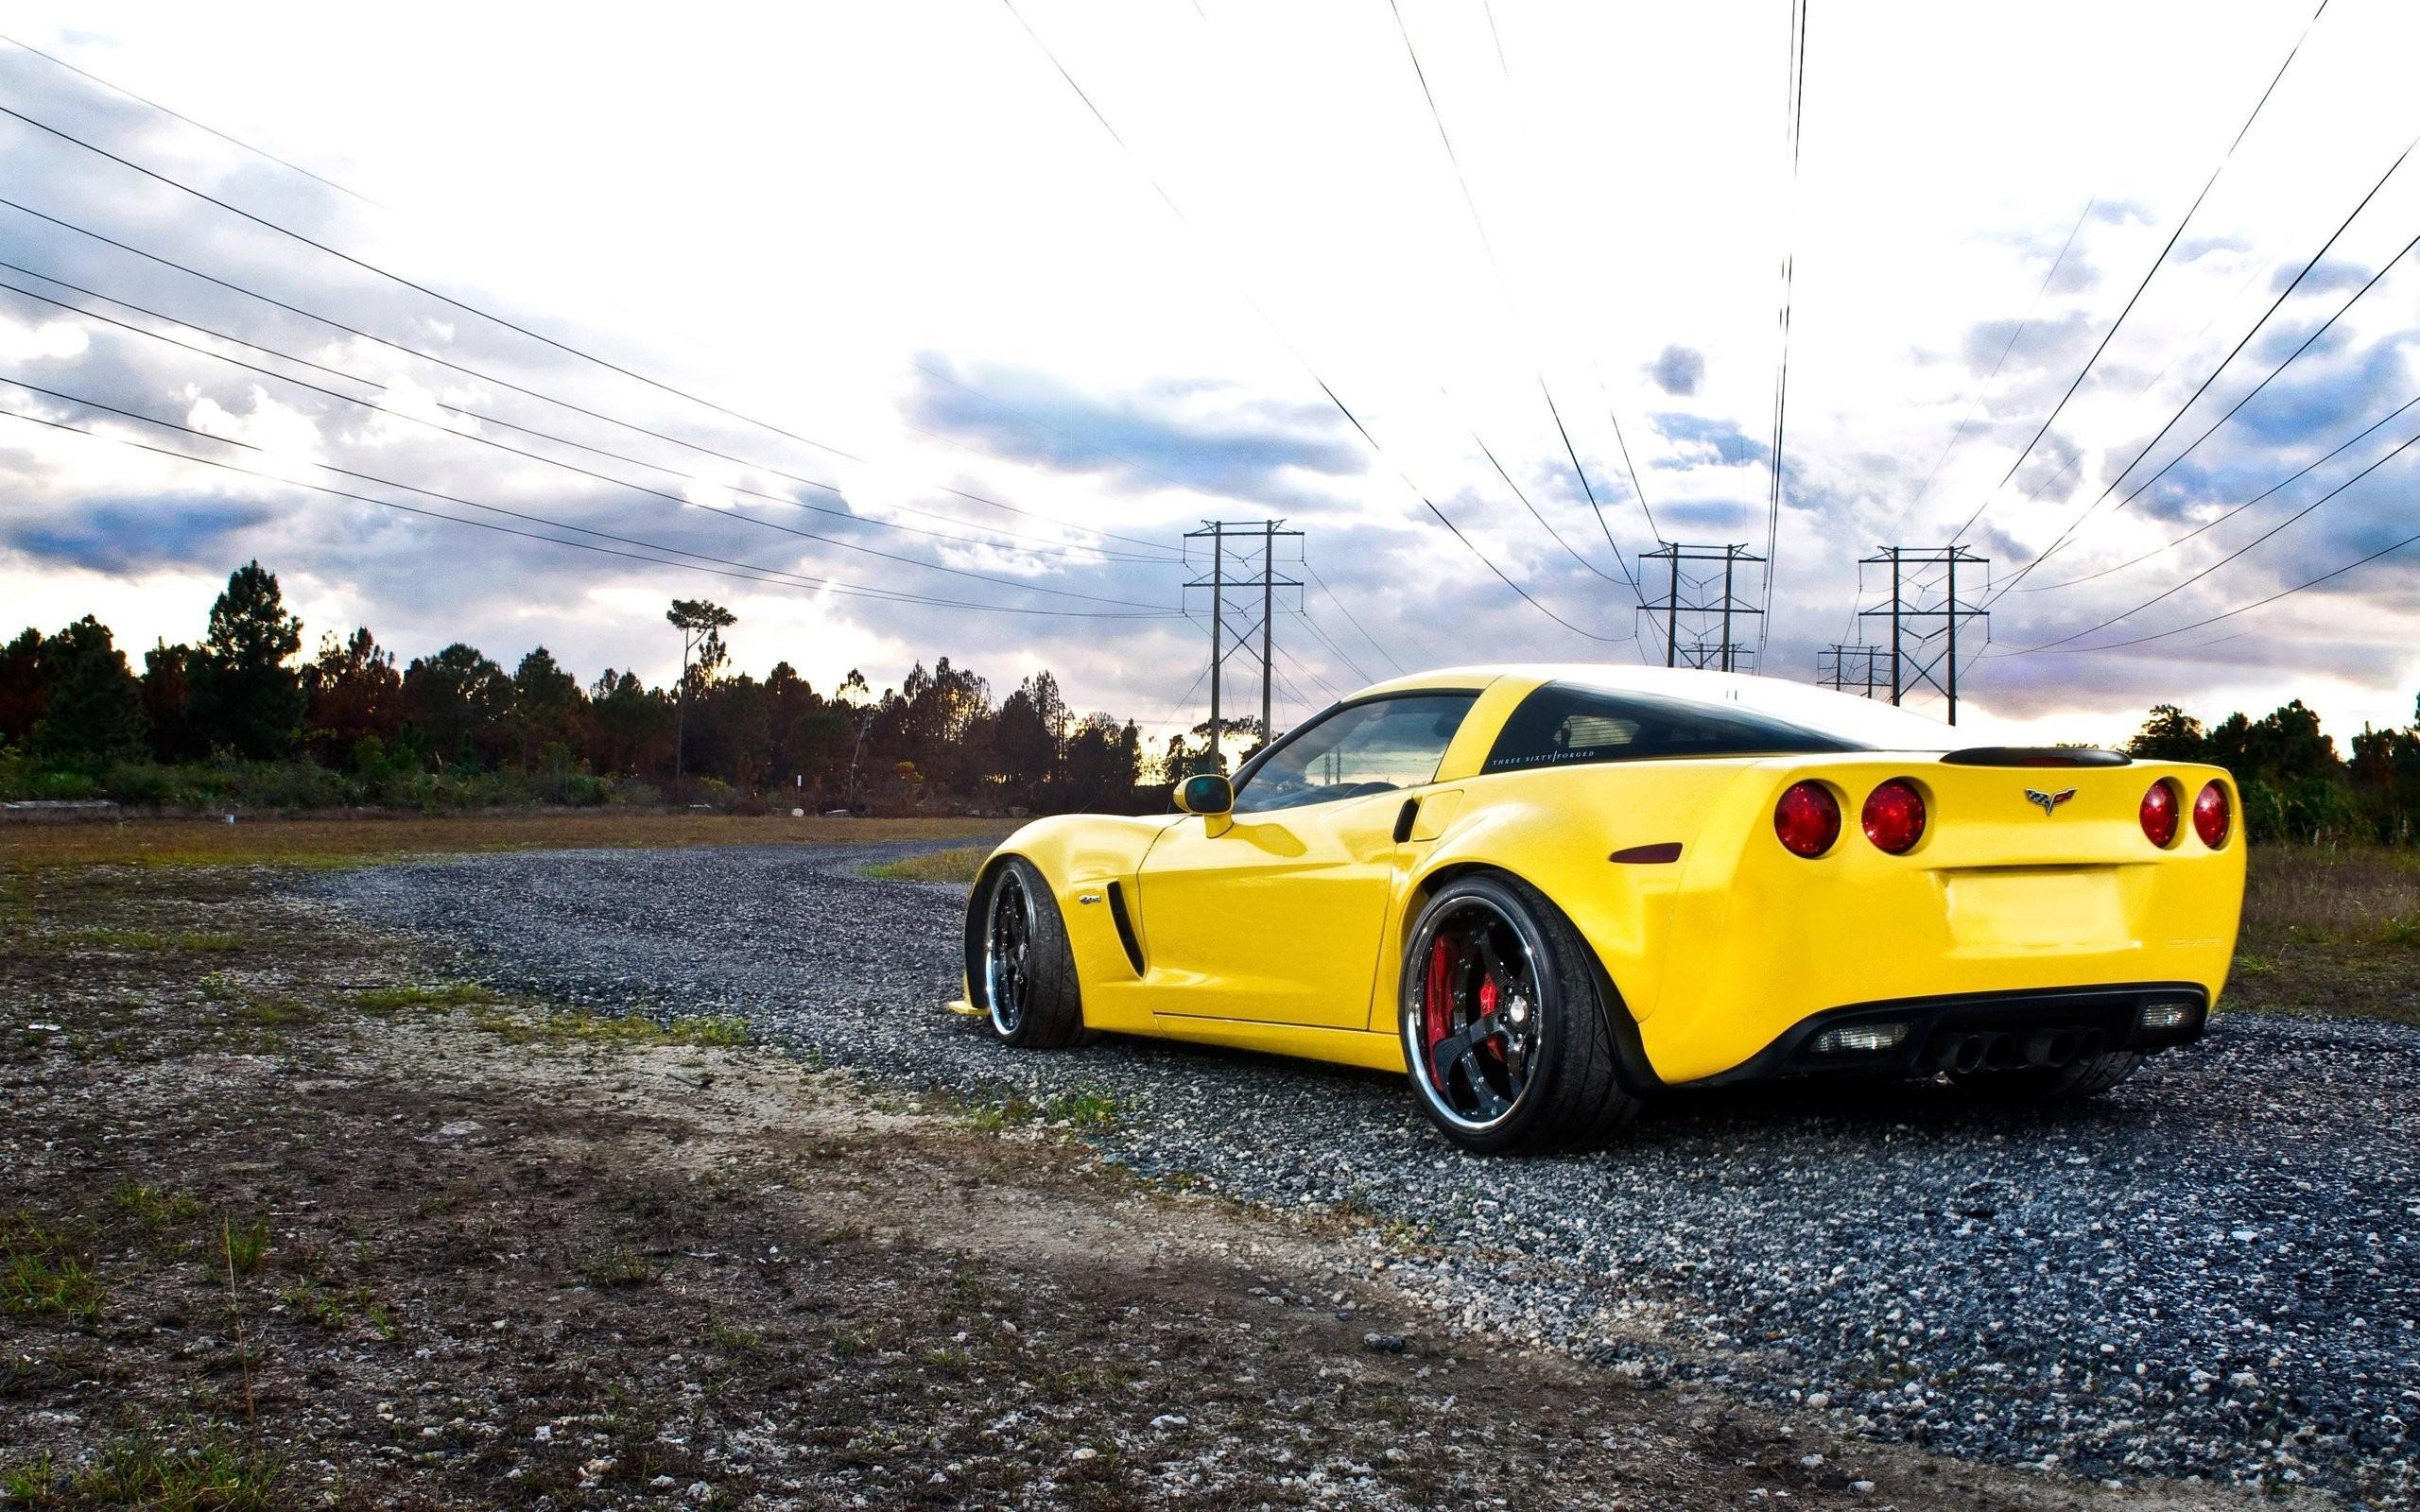 Widebody Corvette Z06 Wallpaper 2560x1600 1735